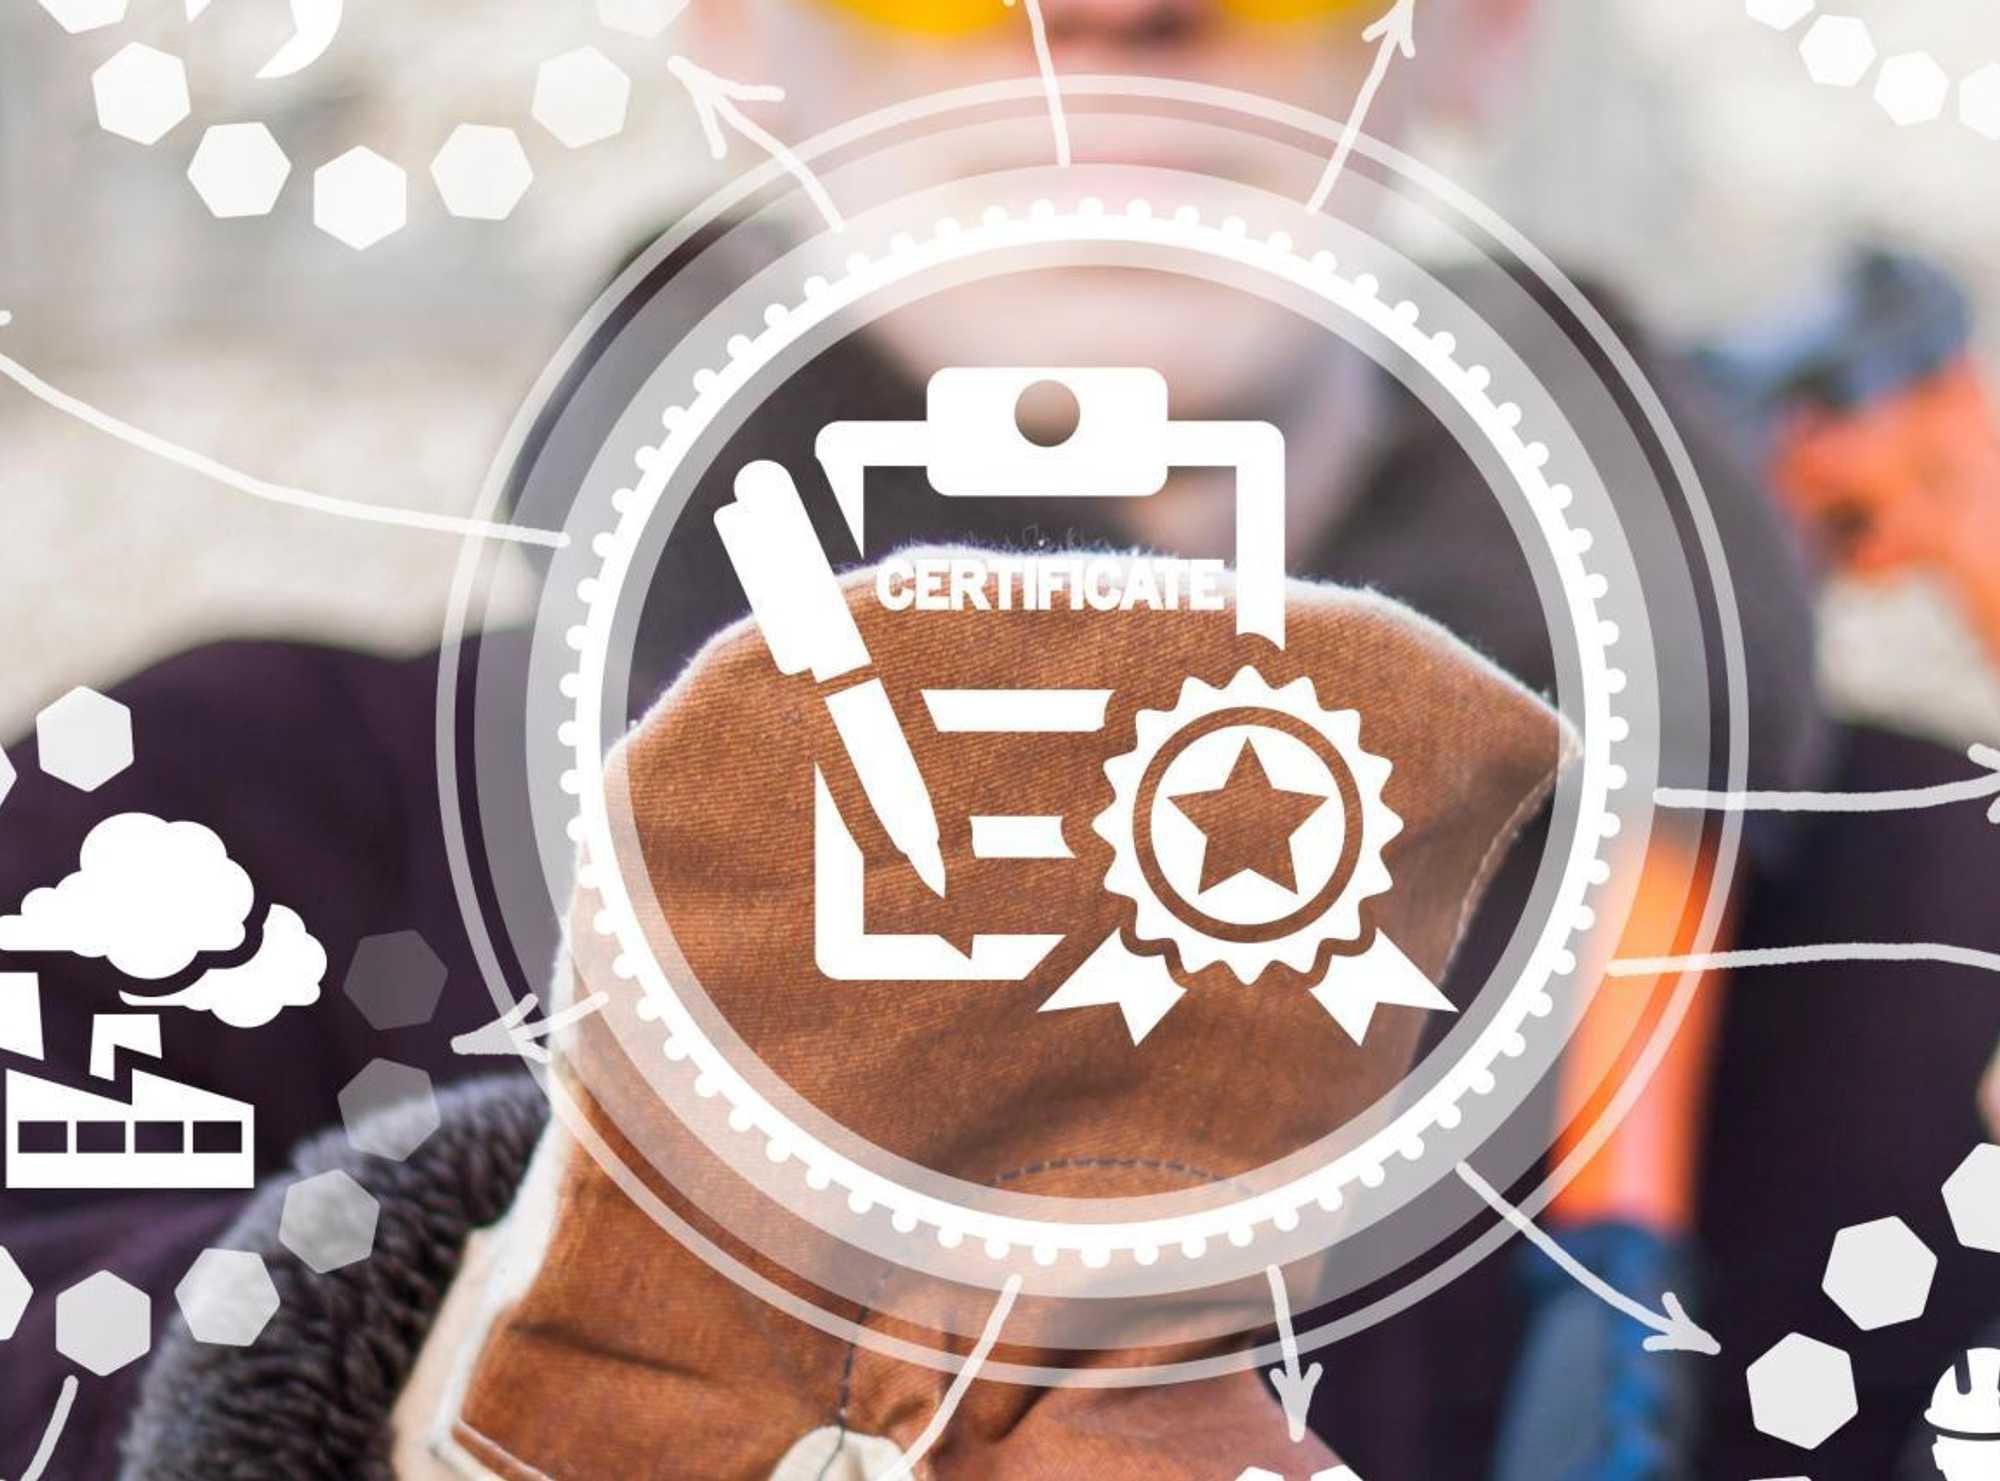 Accruent - Resources - Webinars - Take Control of Regulatory Compliance with Engineering Information - Hero